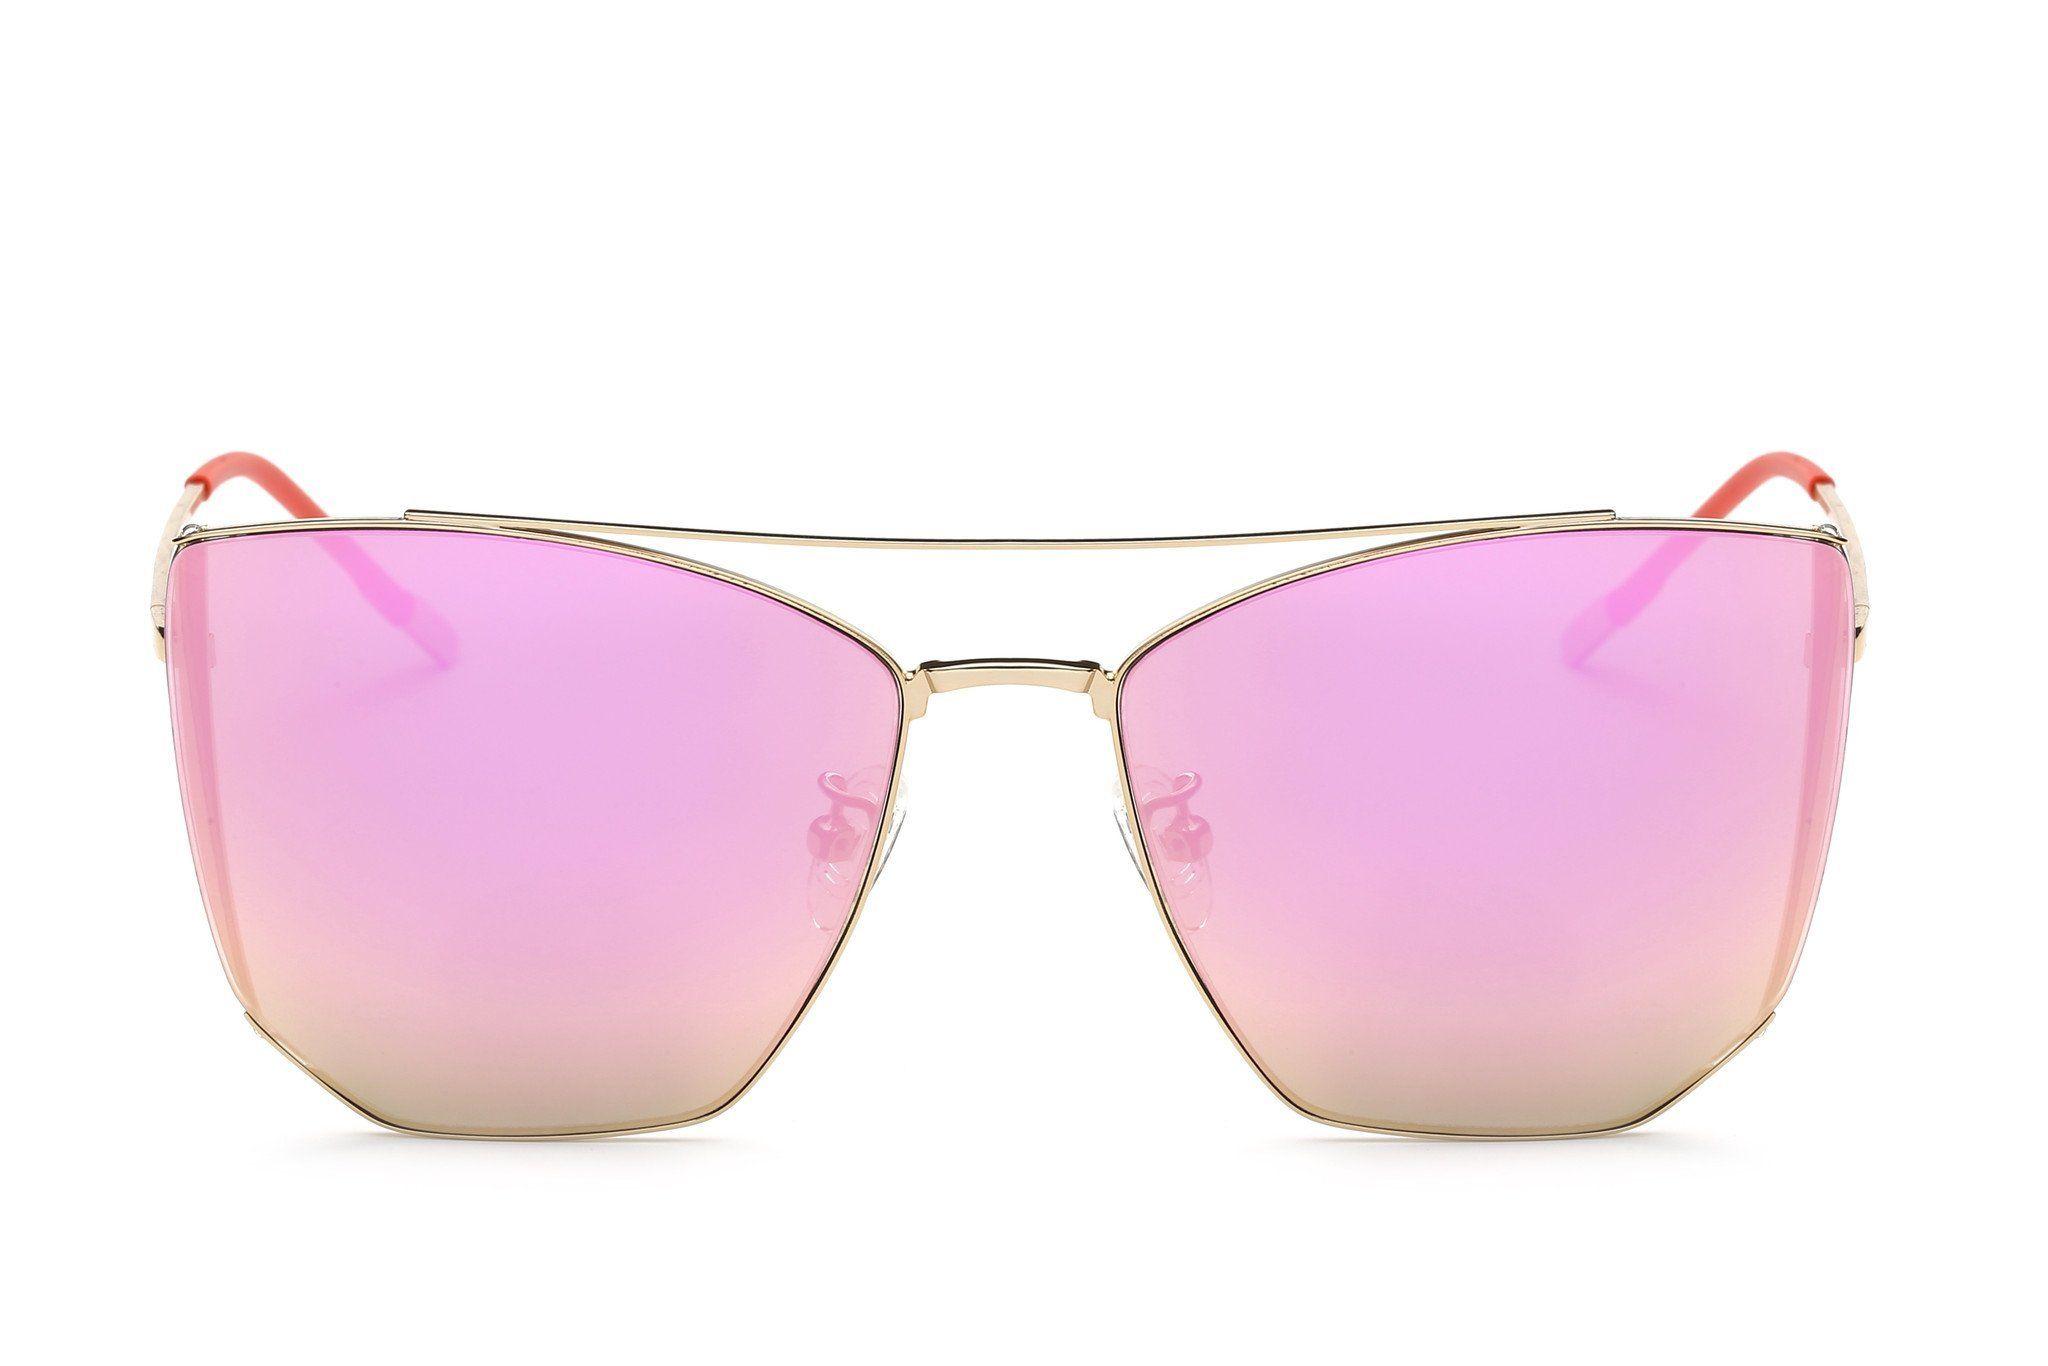 Hana design me style sunglasses stylish fashionista